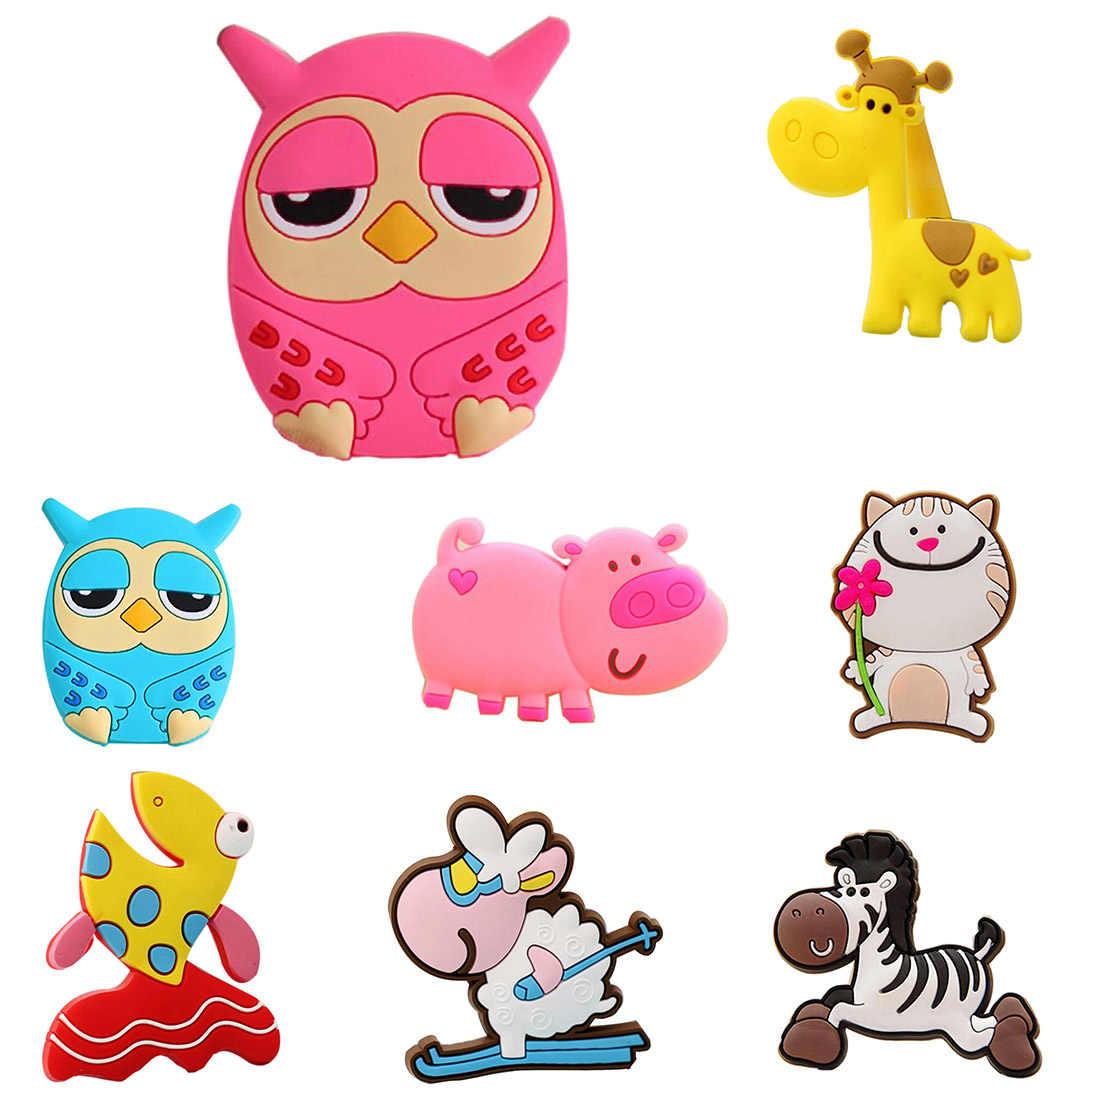 Mini silicone Cartoon Animal Giraffe Owl Cat Pig Fish Sheep Fridge Magnets Kids Gift Home Decoration Whiteboard sticker